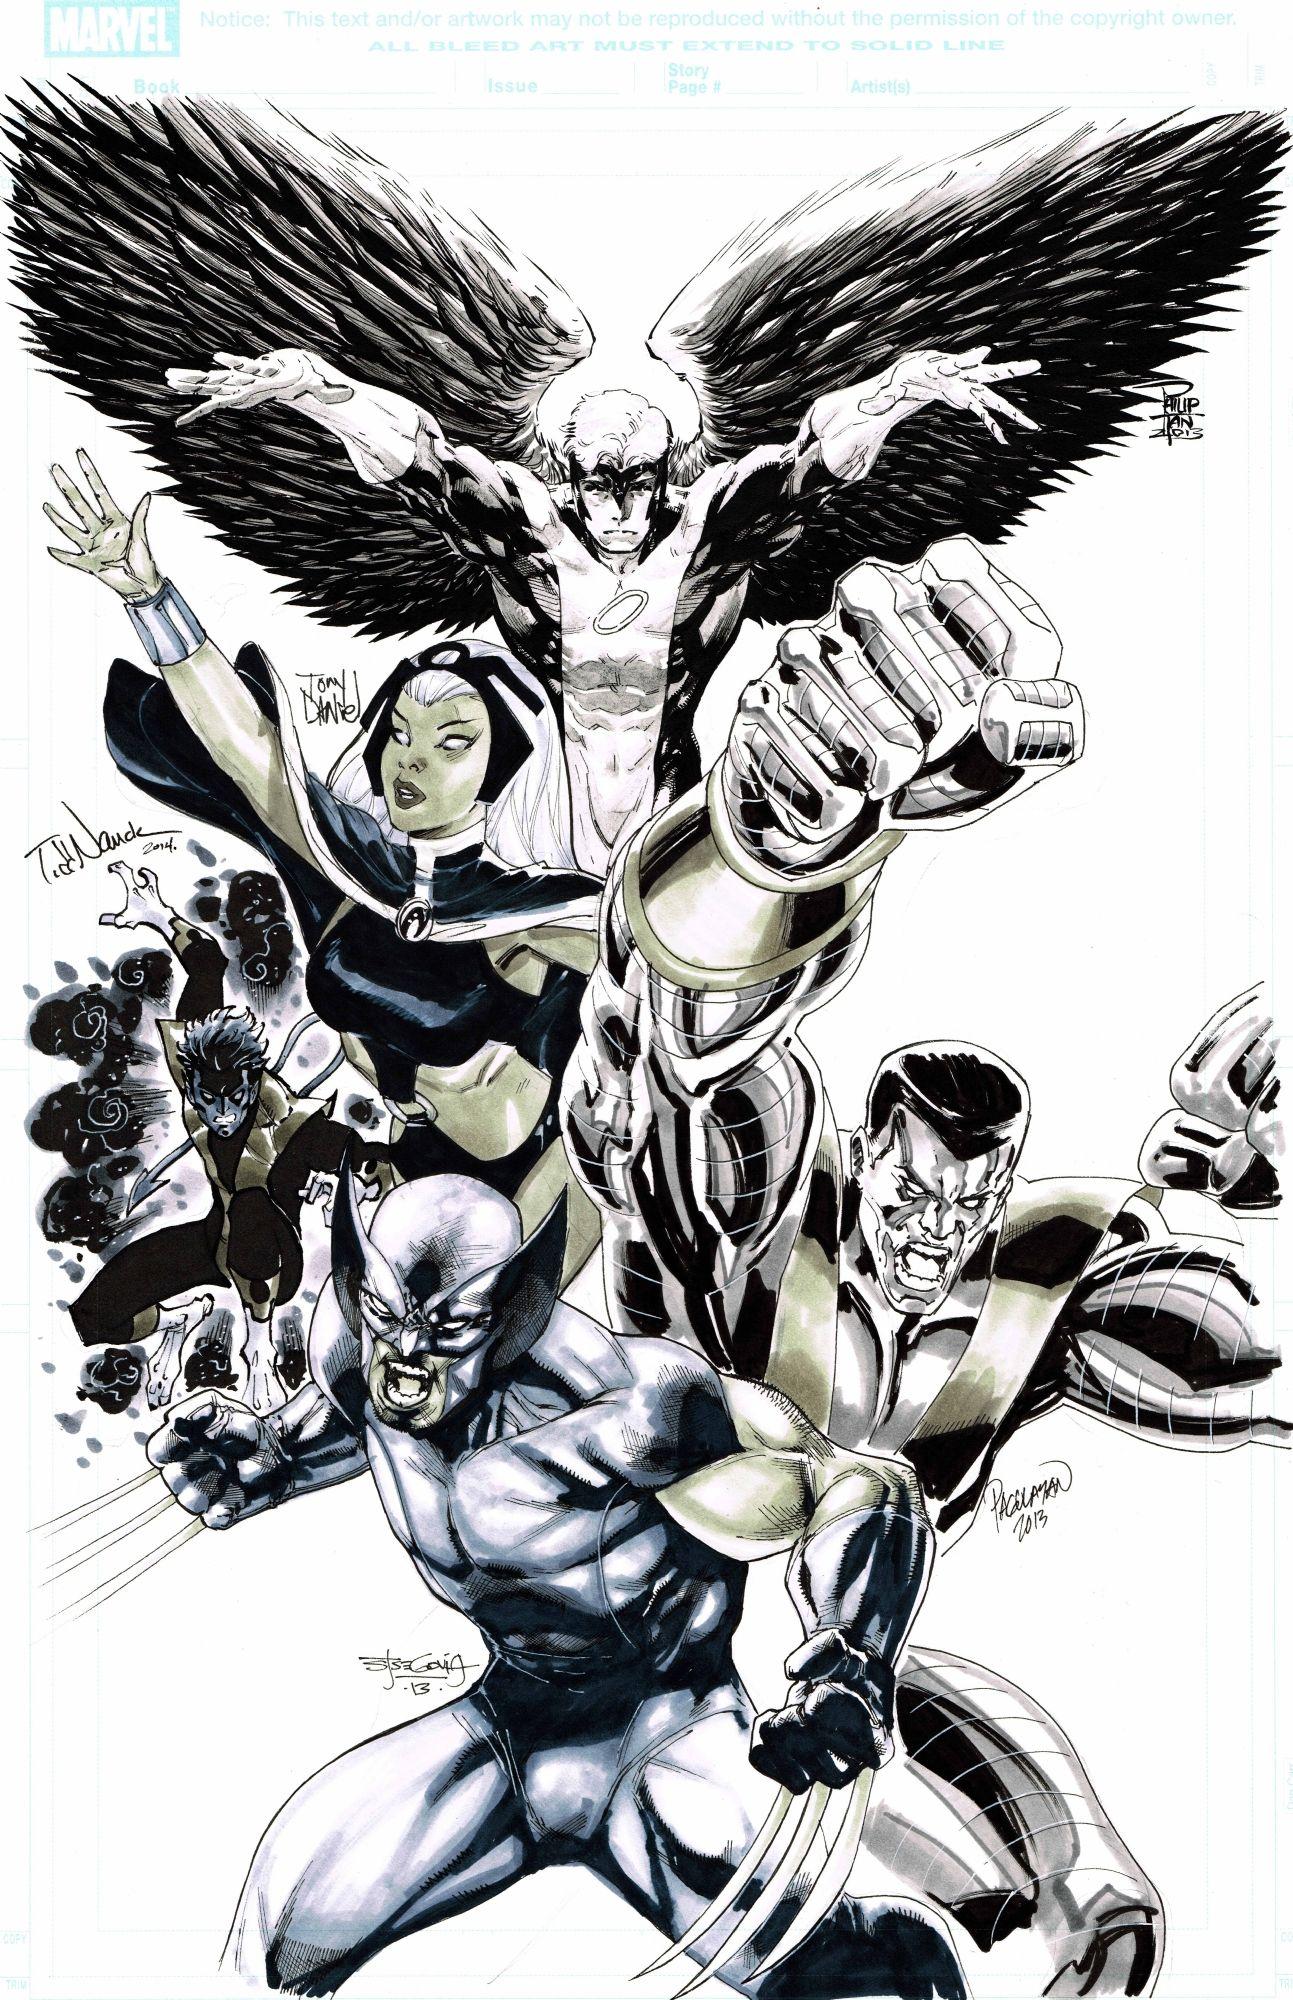 X Men By Philip Tan Todd Nauck Stephen Segovia Tony Daniel Carlo Pagulayan In 2021 X Men Xmen Art Comic Art